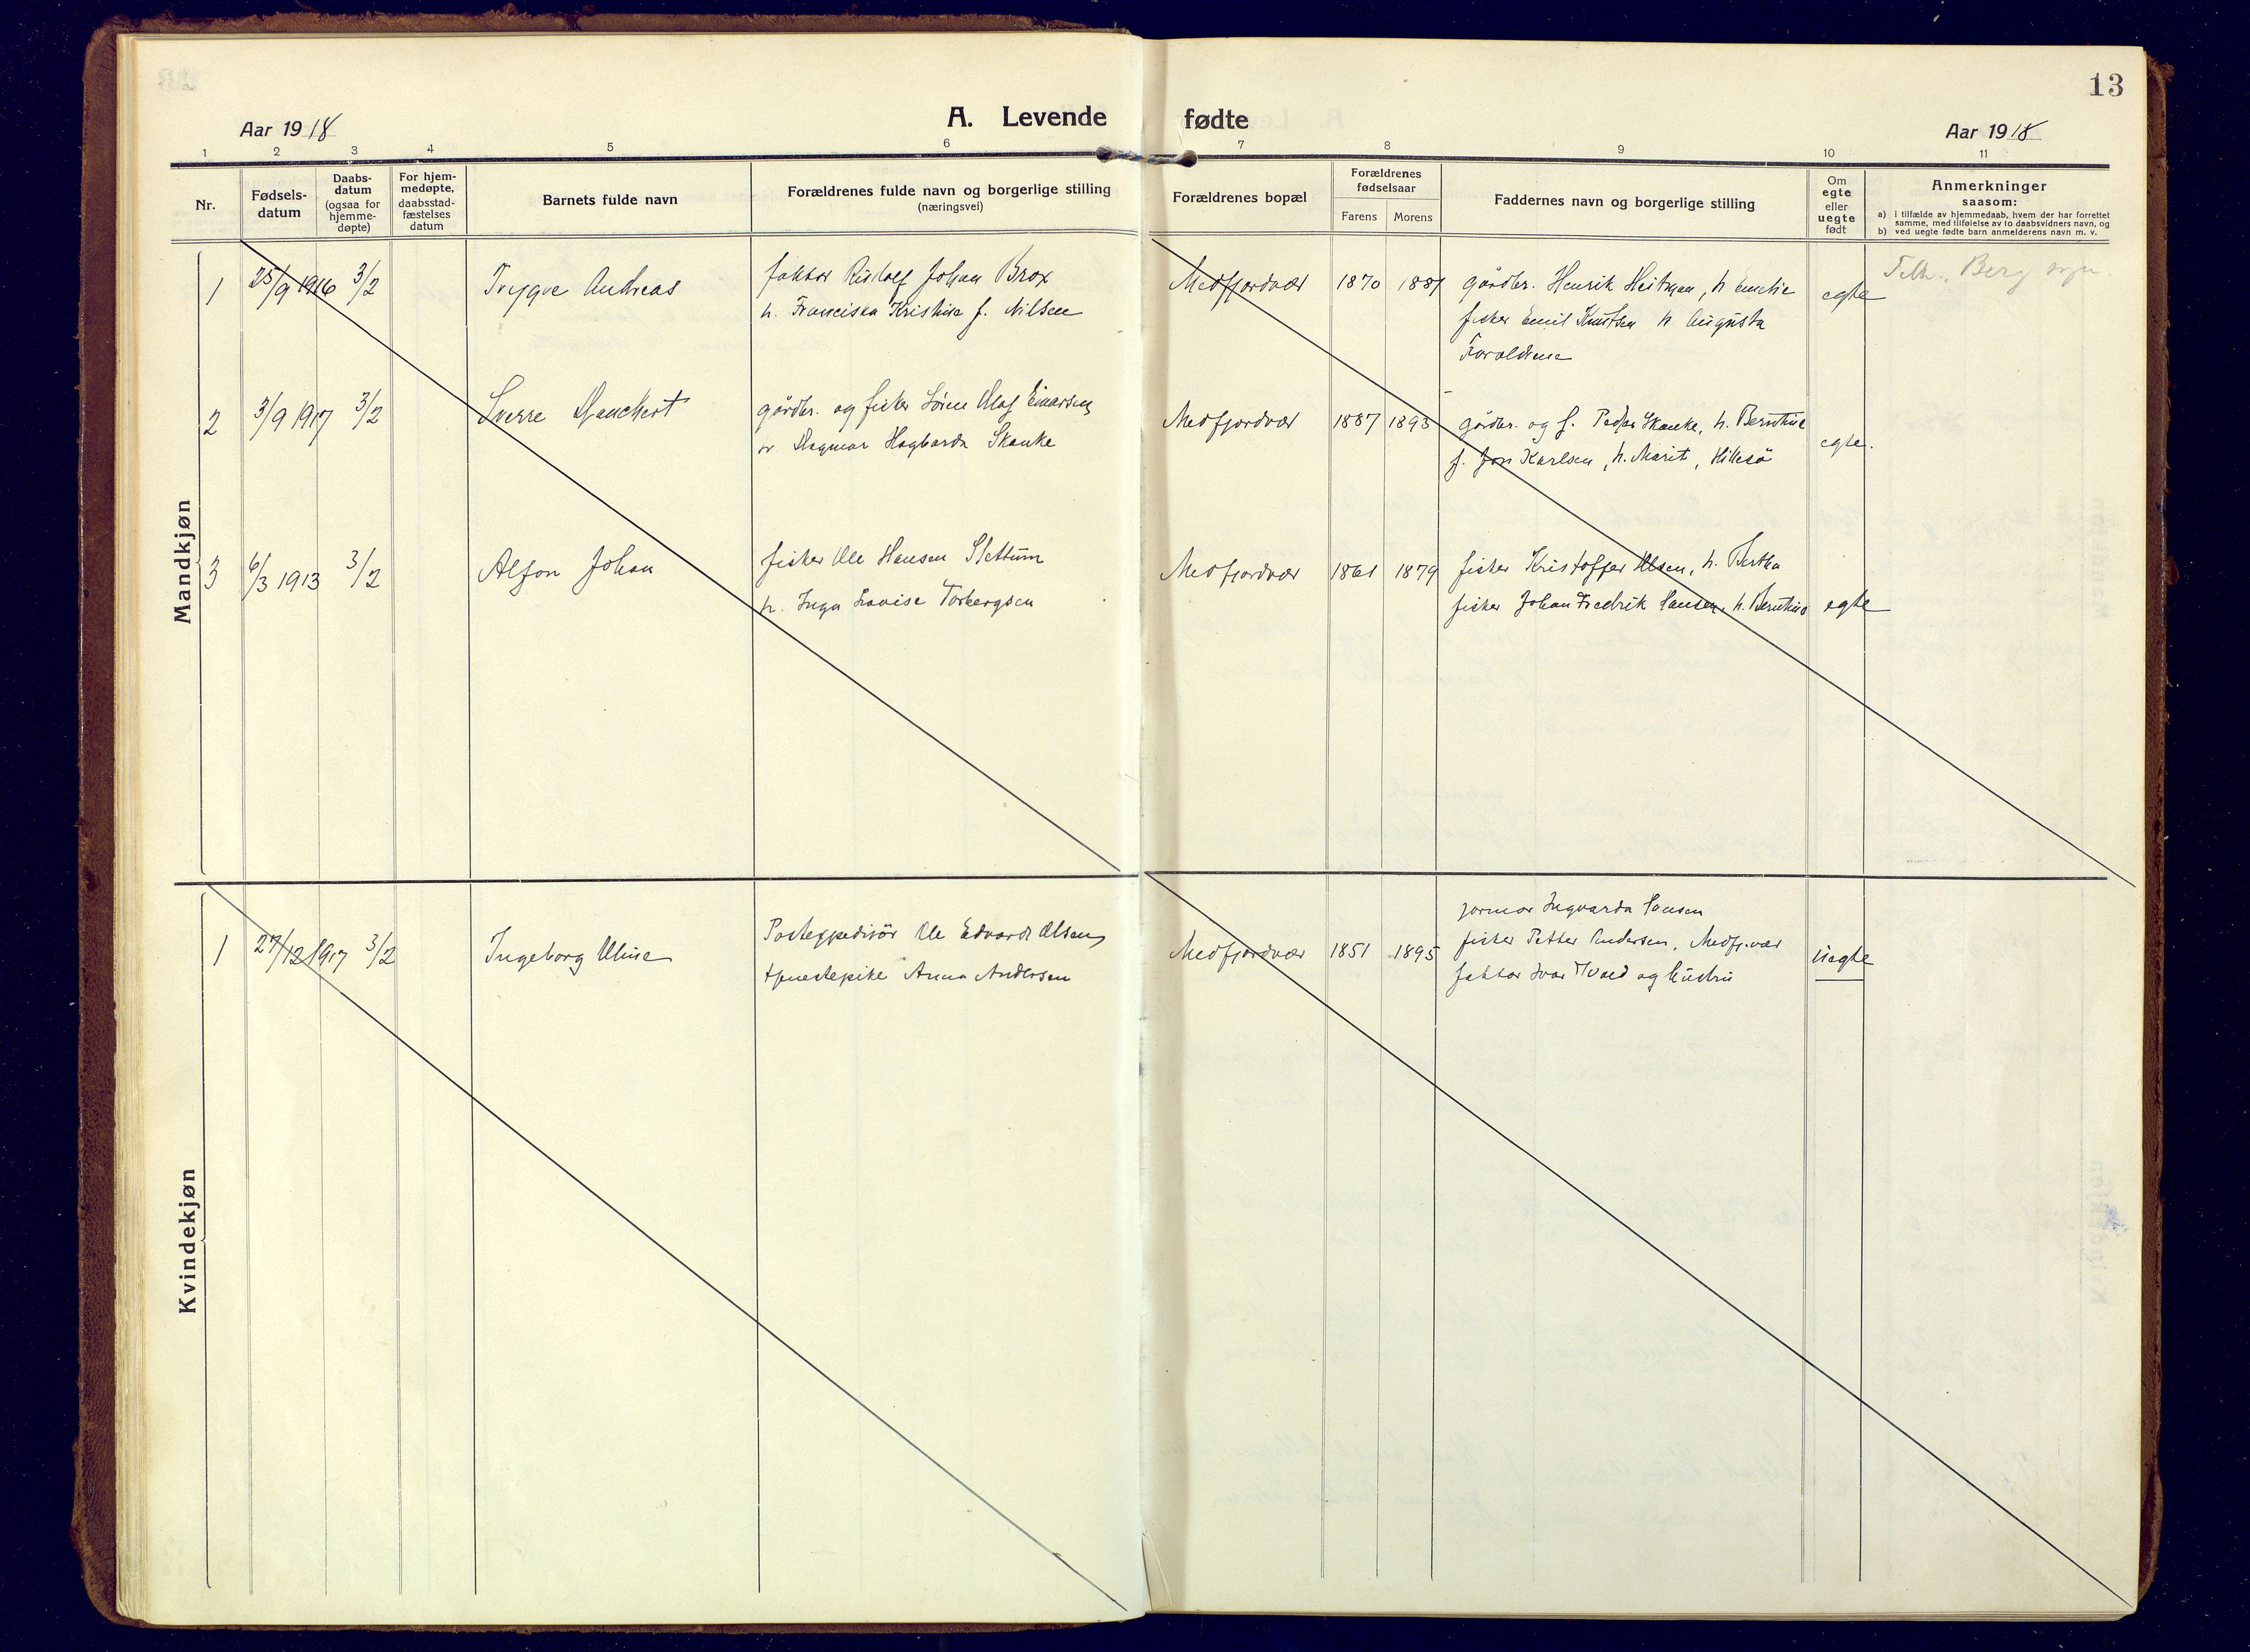 SATØ, Mefjord/Berg sokneprestkontor, G/Ga/Gaa: Ministerialbok nr. 10, 1916-1928, s. 13